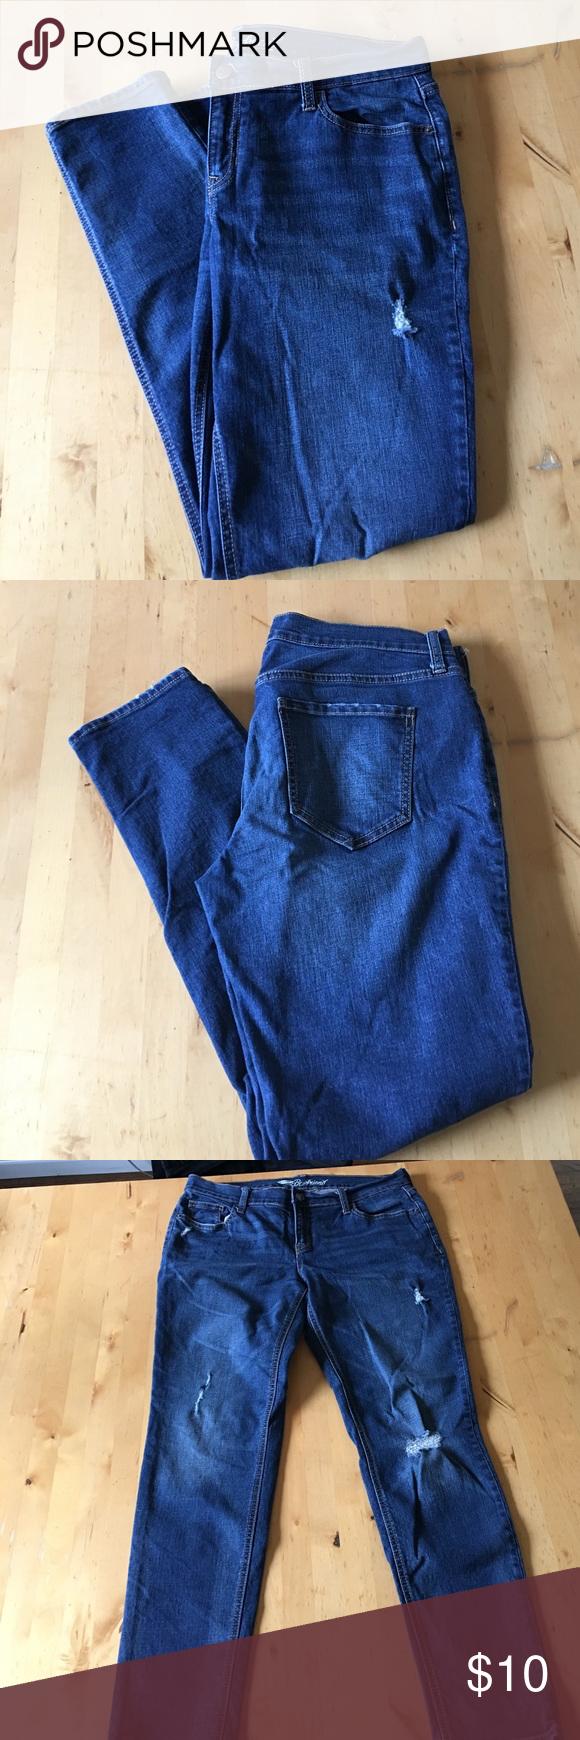 "Old Navy Boyfriend Jeans Boyfriend Jeans 27 1/2"" inseam. Great cuffed up. No trades/no paypal. 10% bundle discount. Old Navy Jeans Boyfriend"